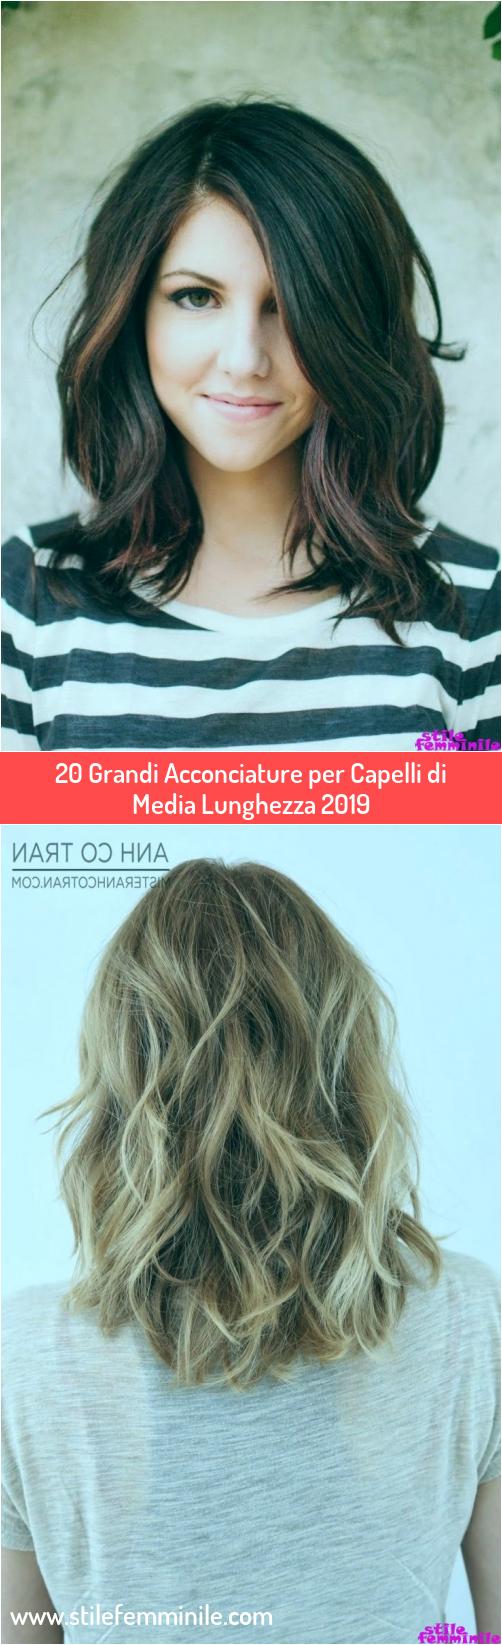 Photo of 20 Grandi Acconciature per Capelli di Media Lunghezza 2019